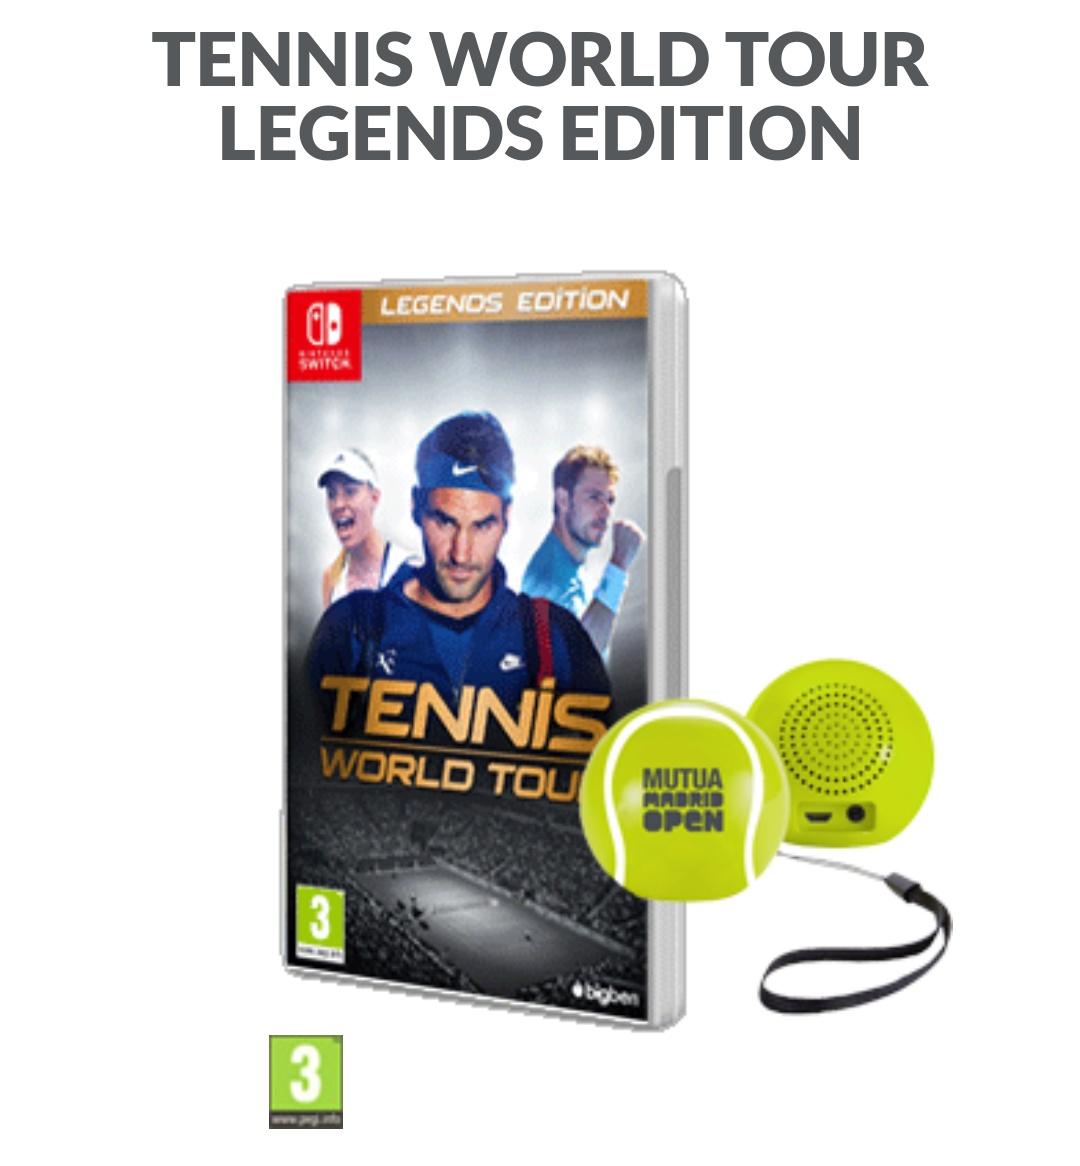 Tennis World Tour Legends Edition con altavoz bluetooth pelota de tenis. Nintendo Switch.